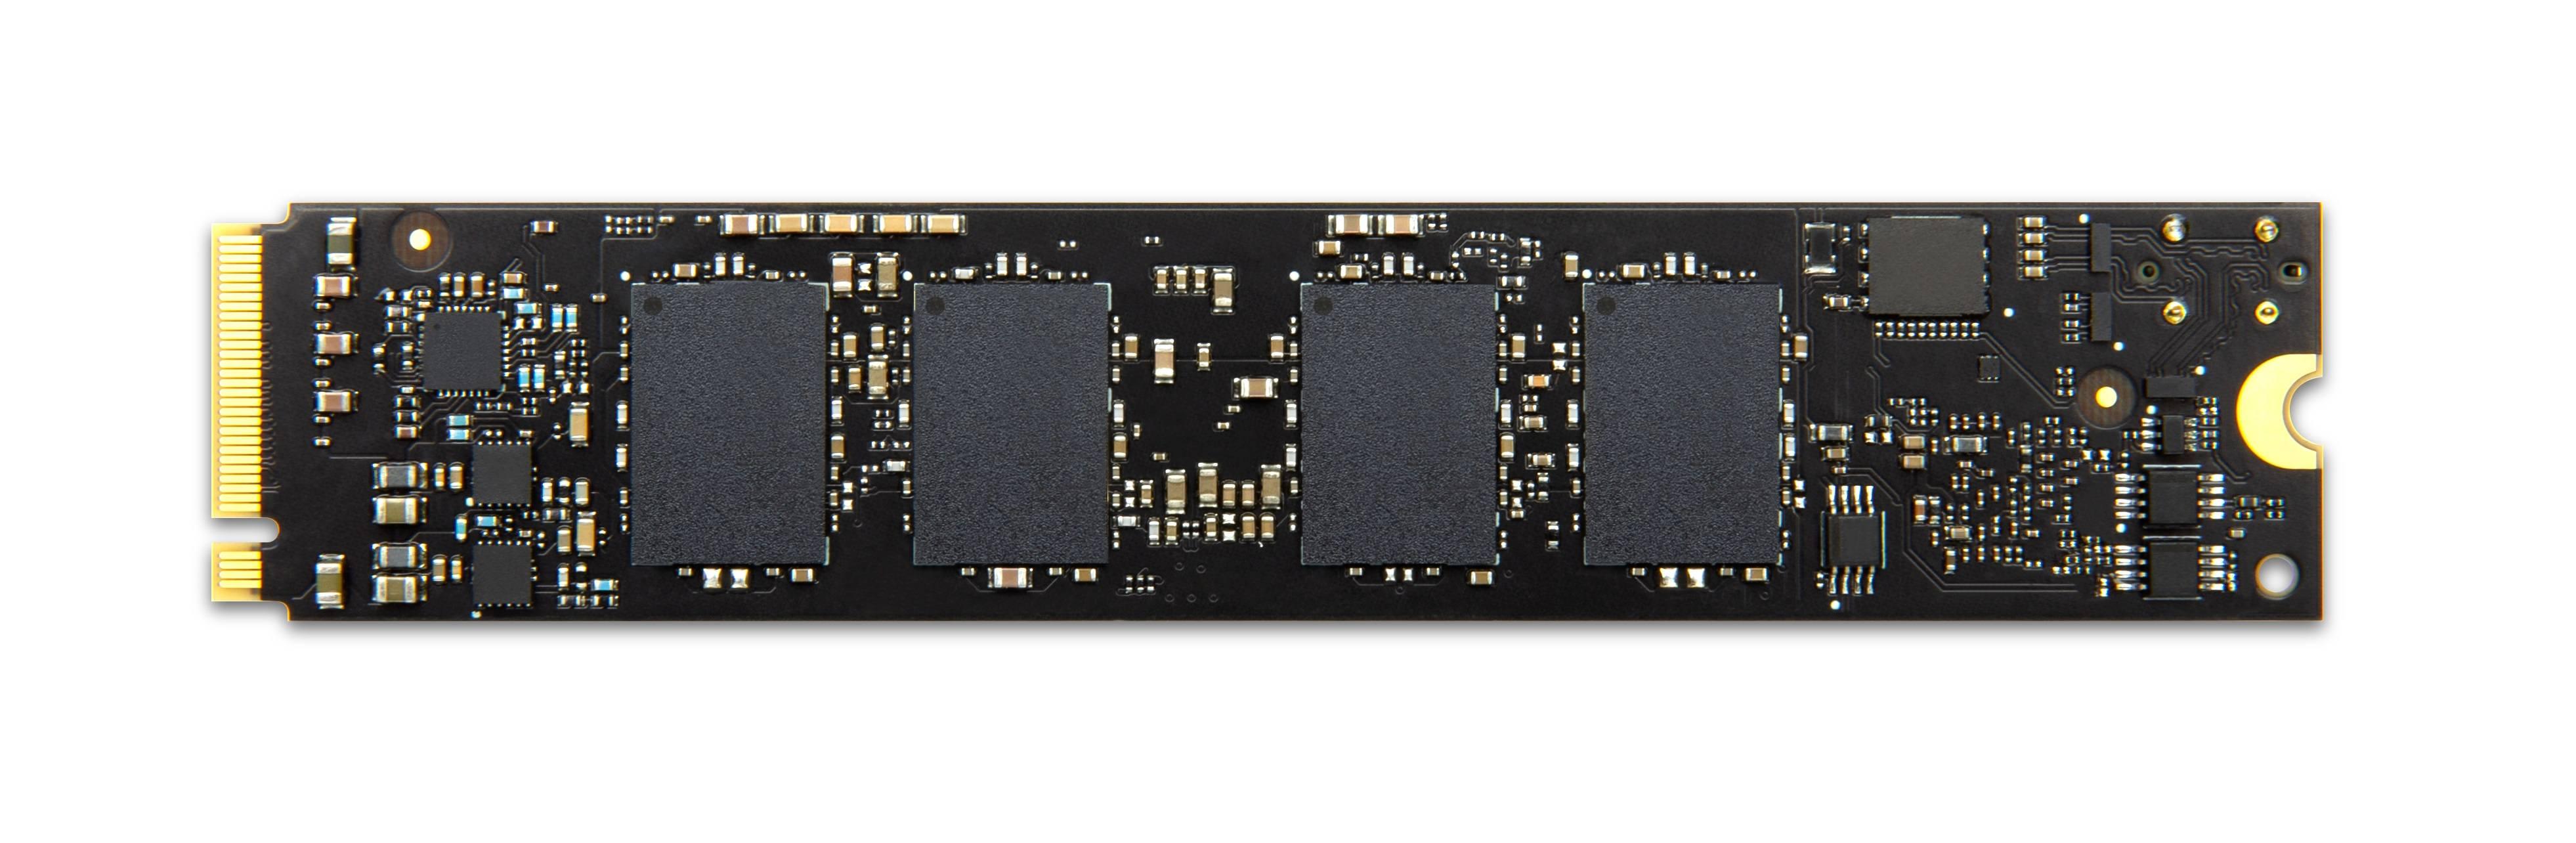 Intel-NNP-I-m2-card-1